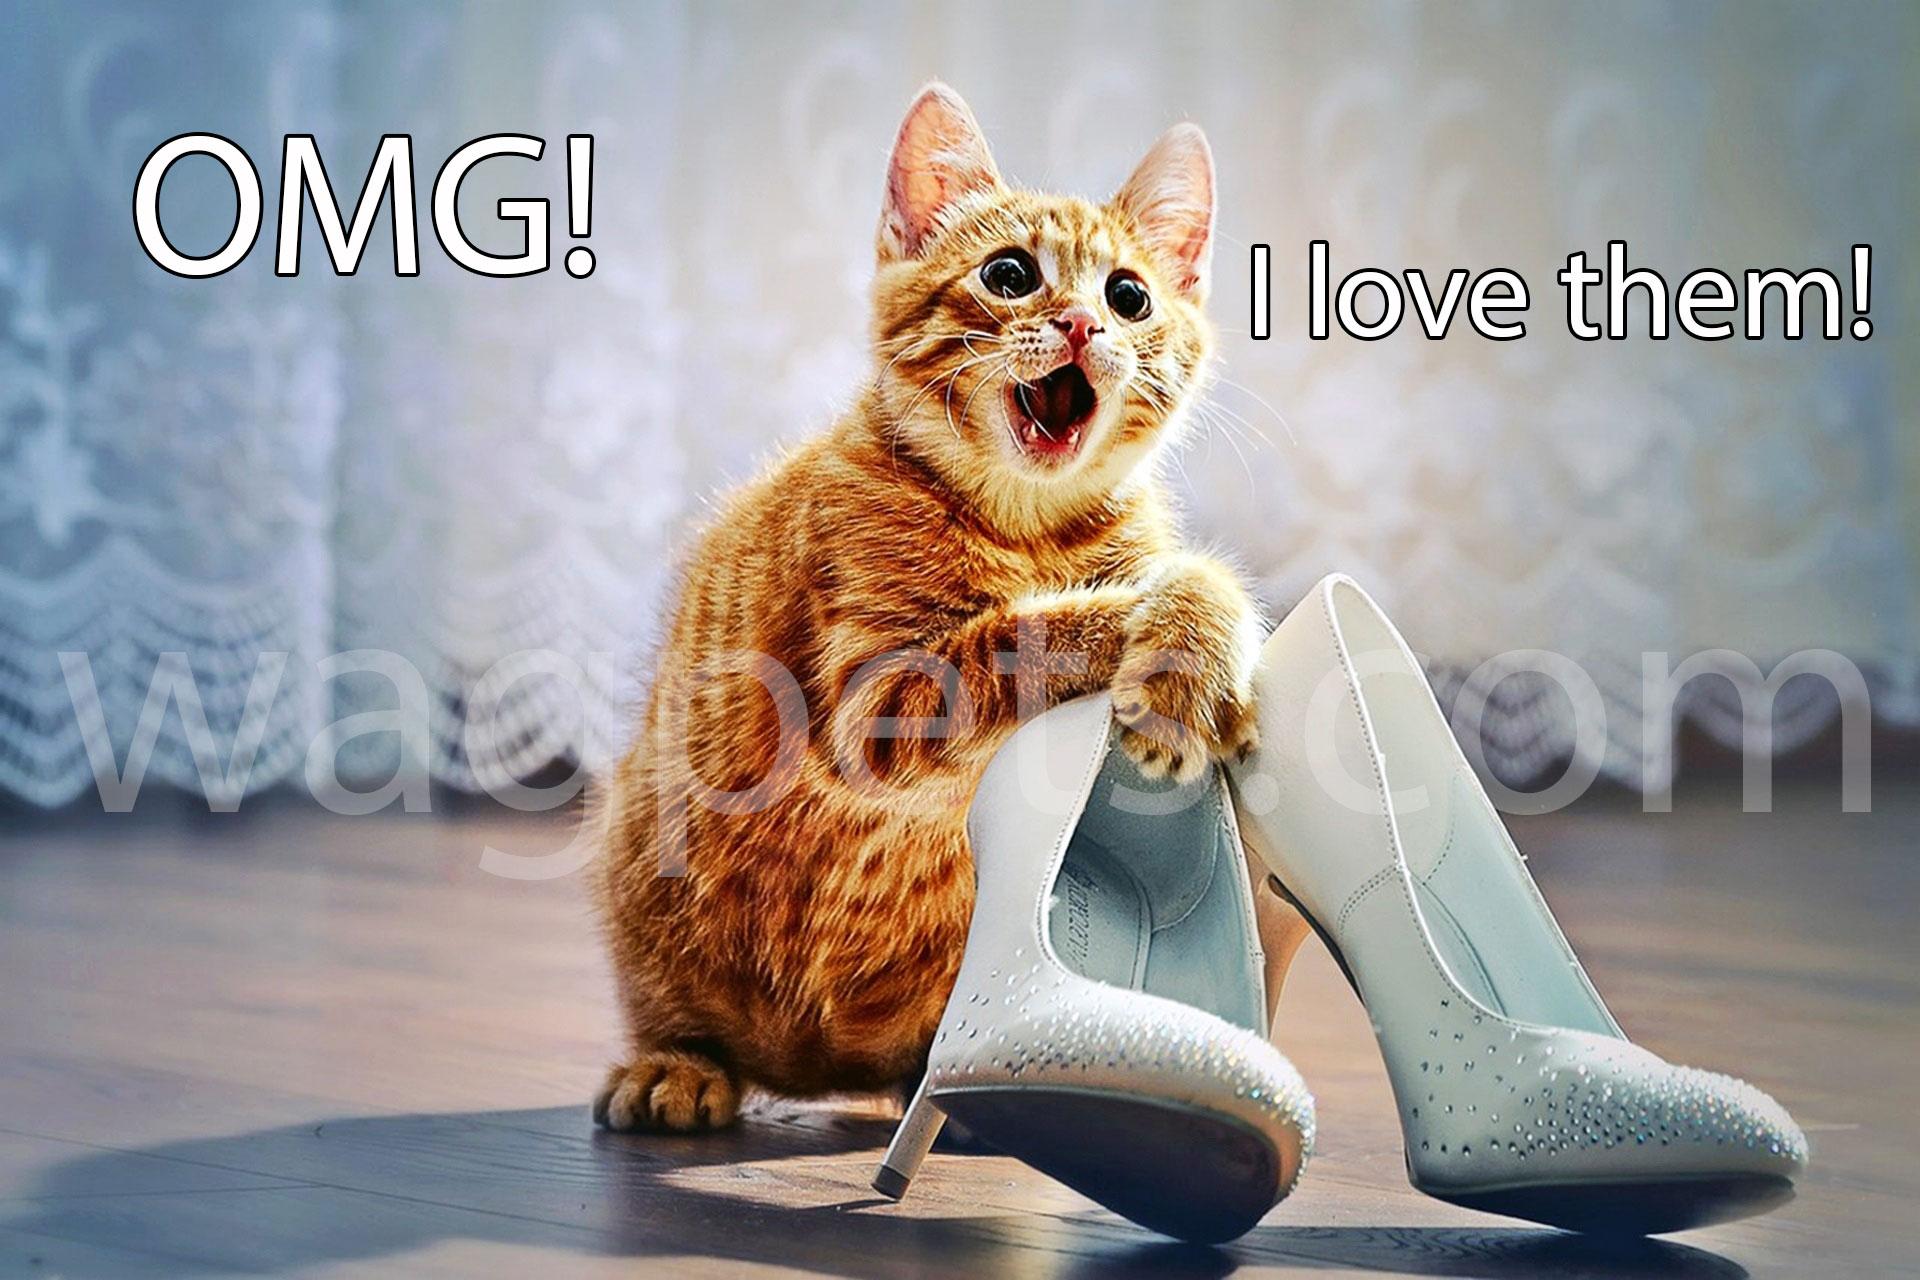 OMG! I love them!